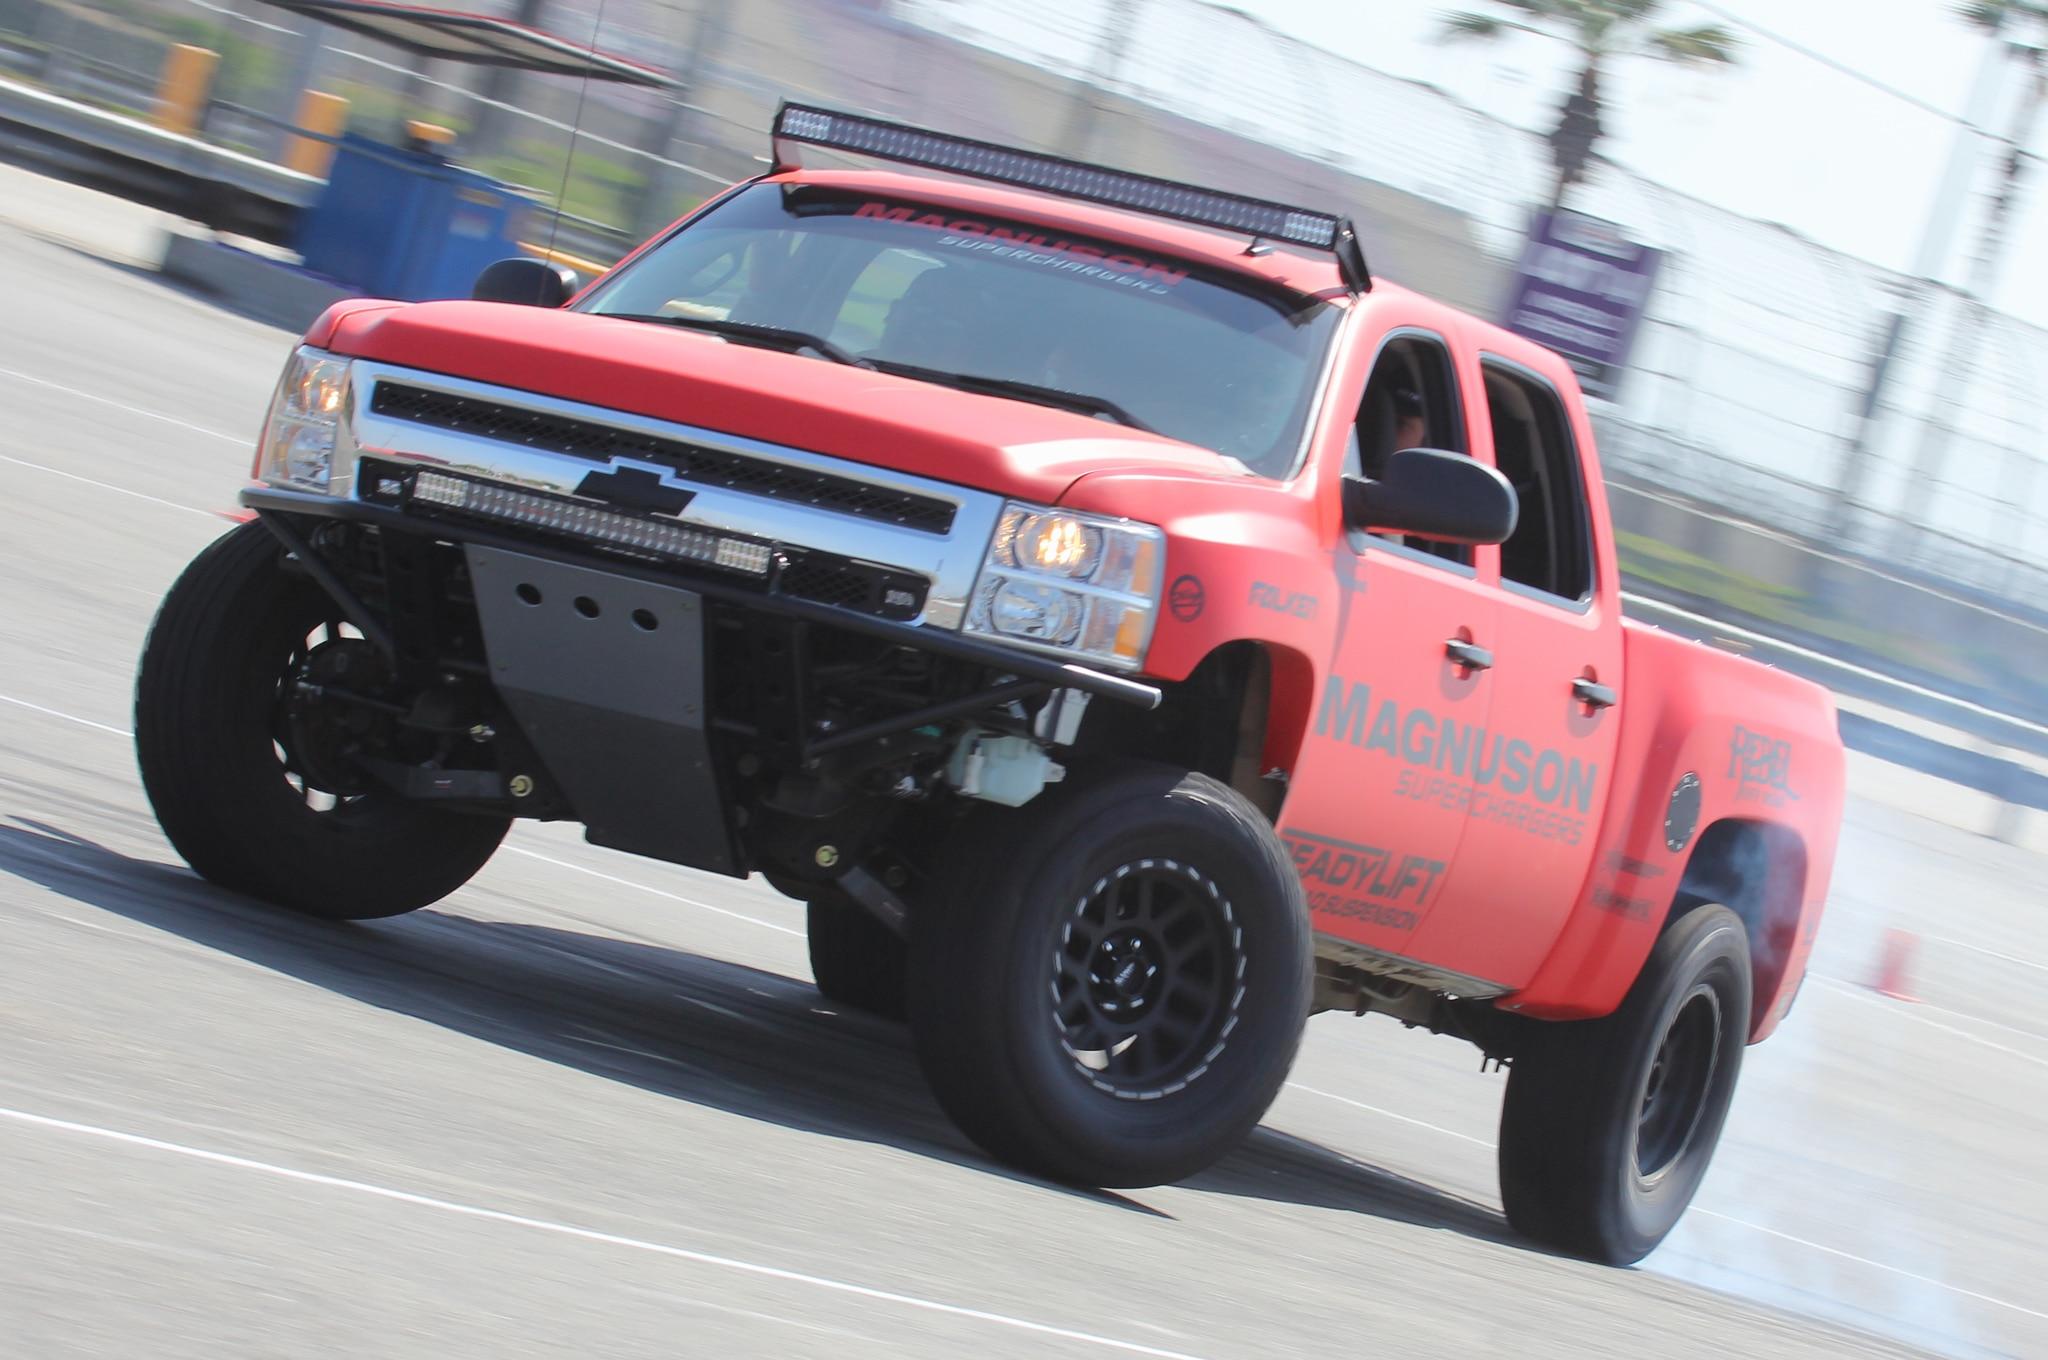 2012 Chevrolet Silverado 1500 - Truckin Throwdown 2014, Presented by EBC Brakes